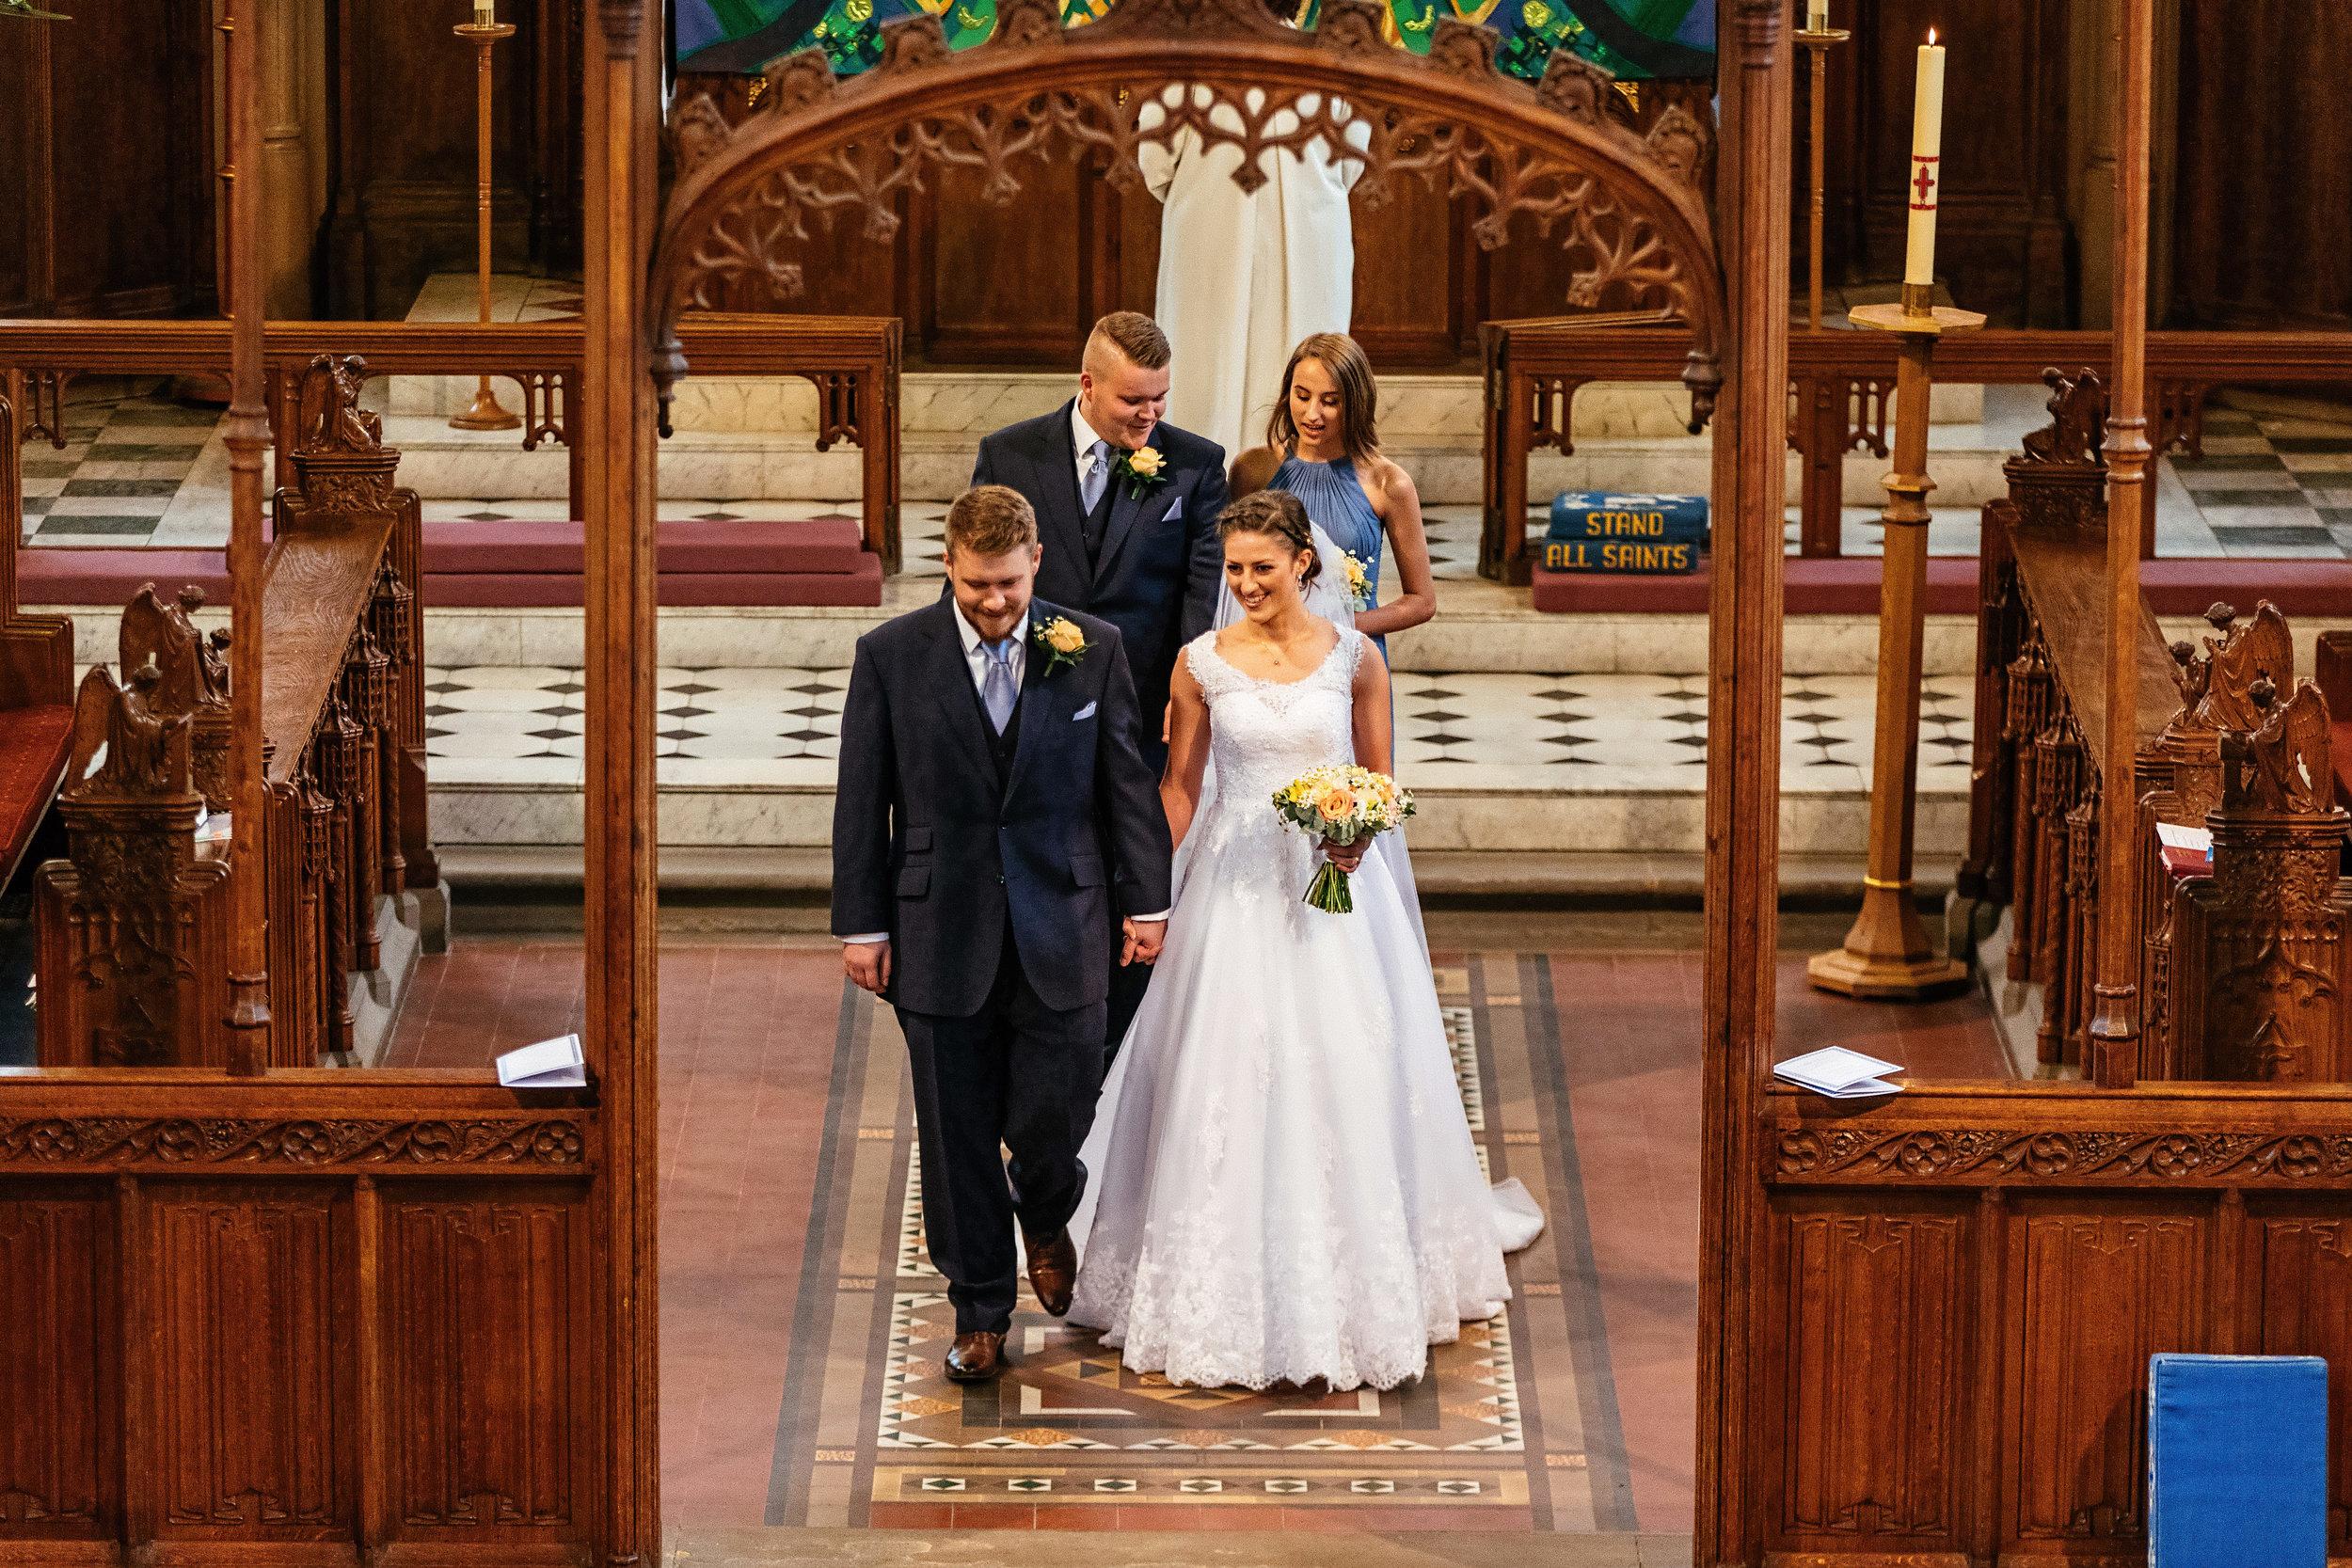 Kathryn-and-Mike-Wedding-Highlights-32.jpg